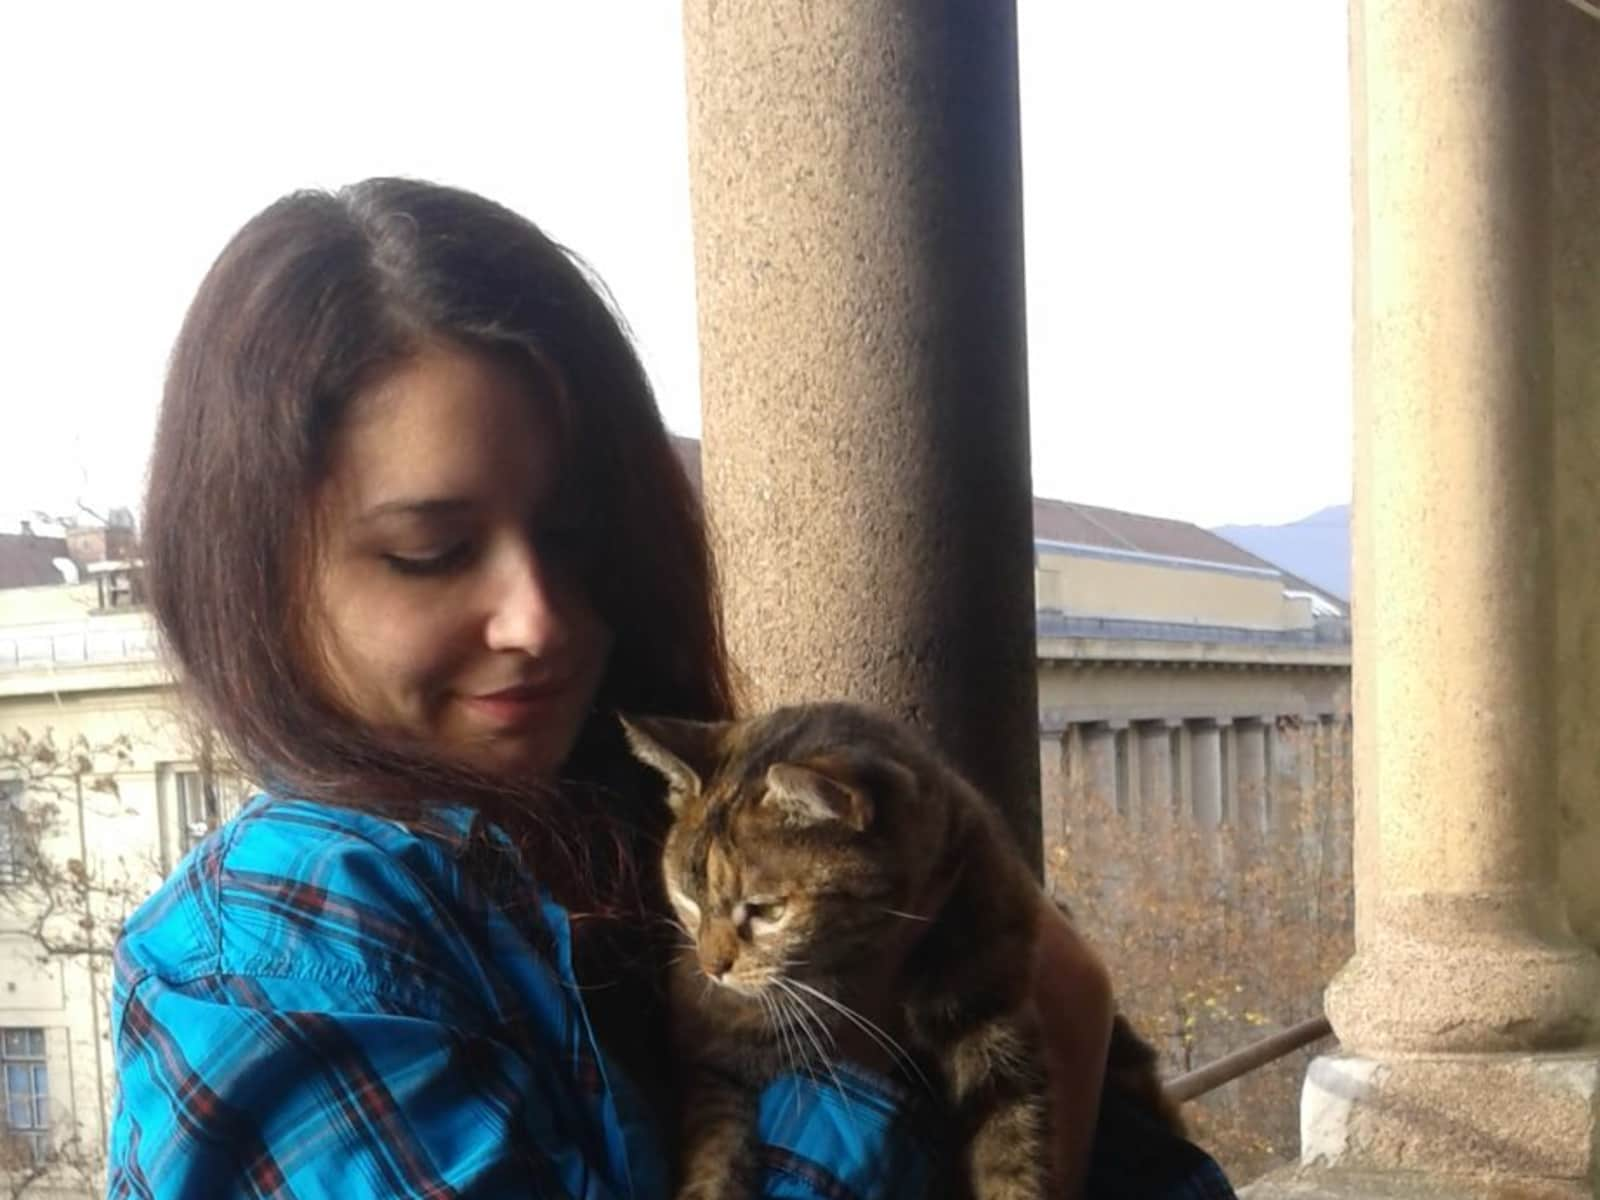 Ana from Zagreb, Croatia